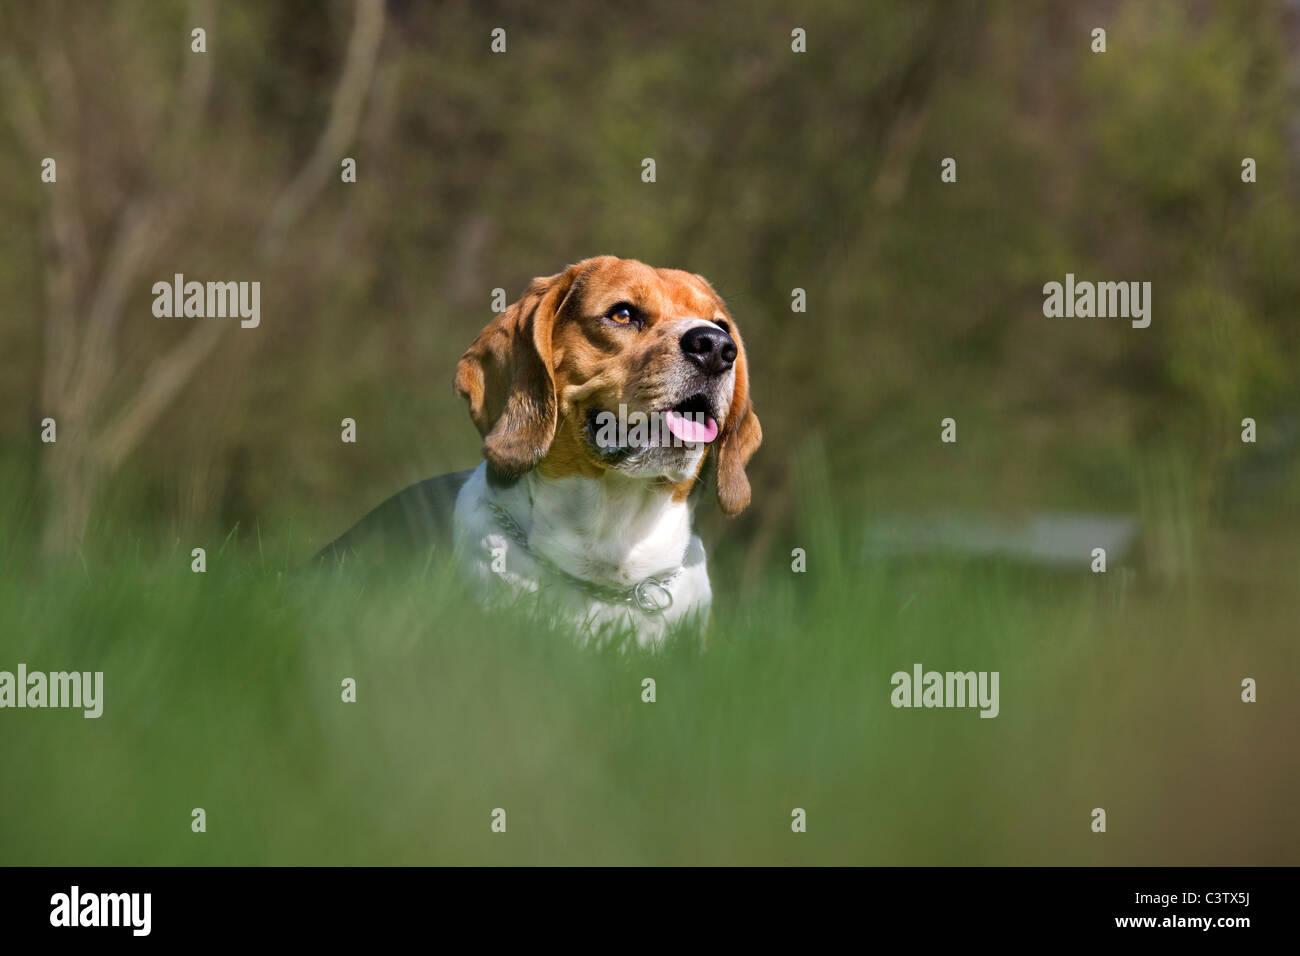 Beagle (Canis lupus familiaris) panting in garden - Stock Image